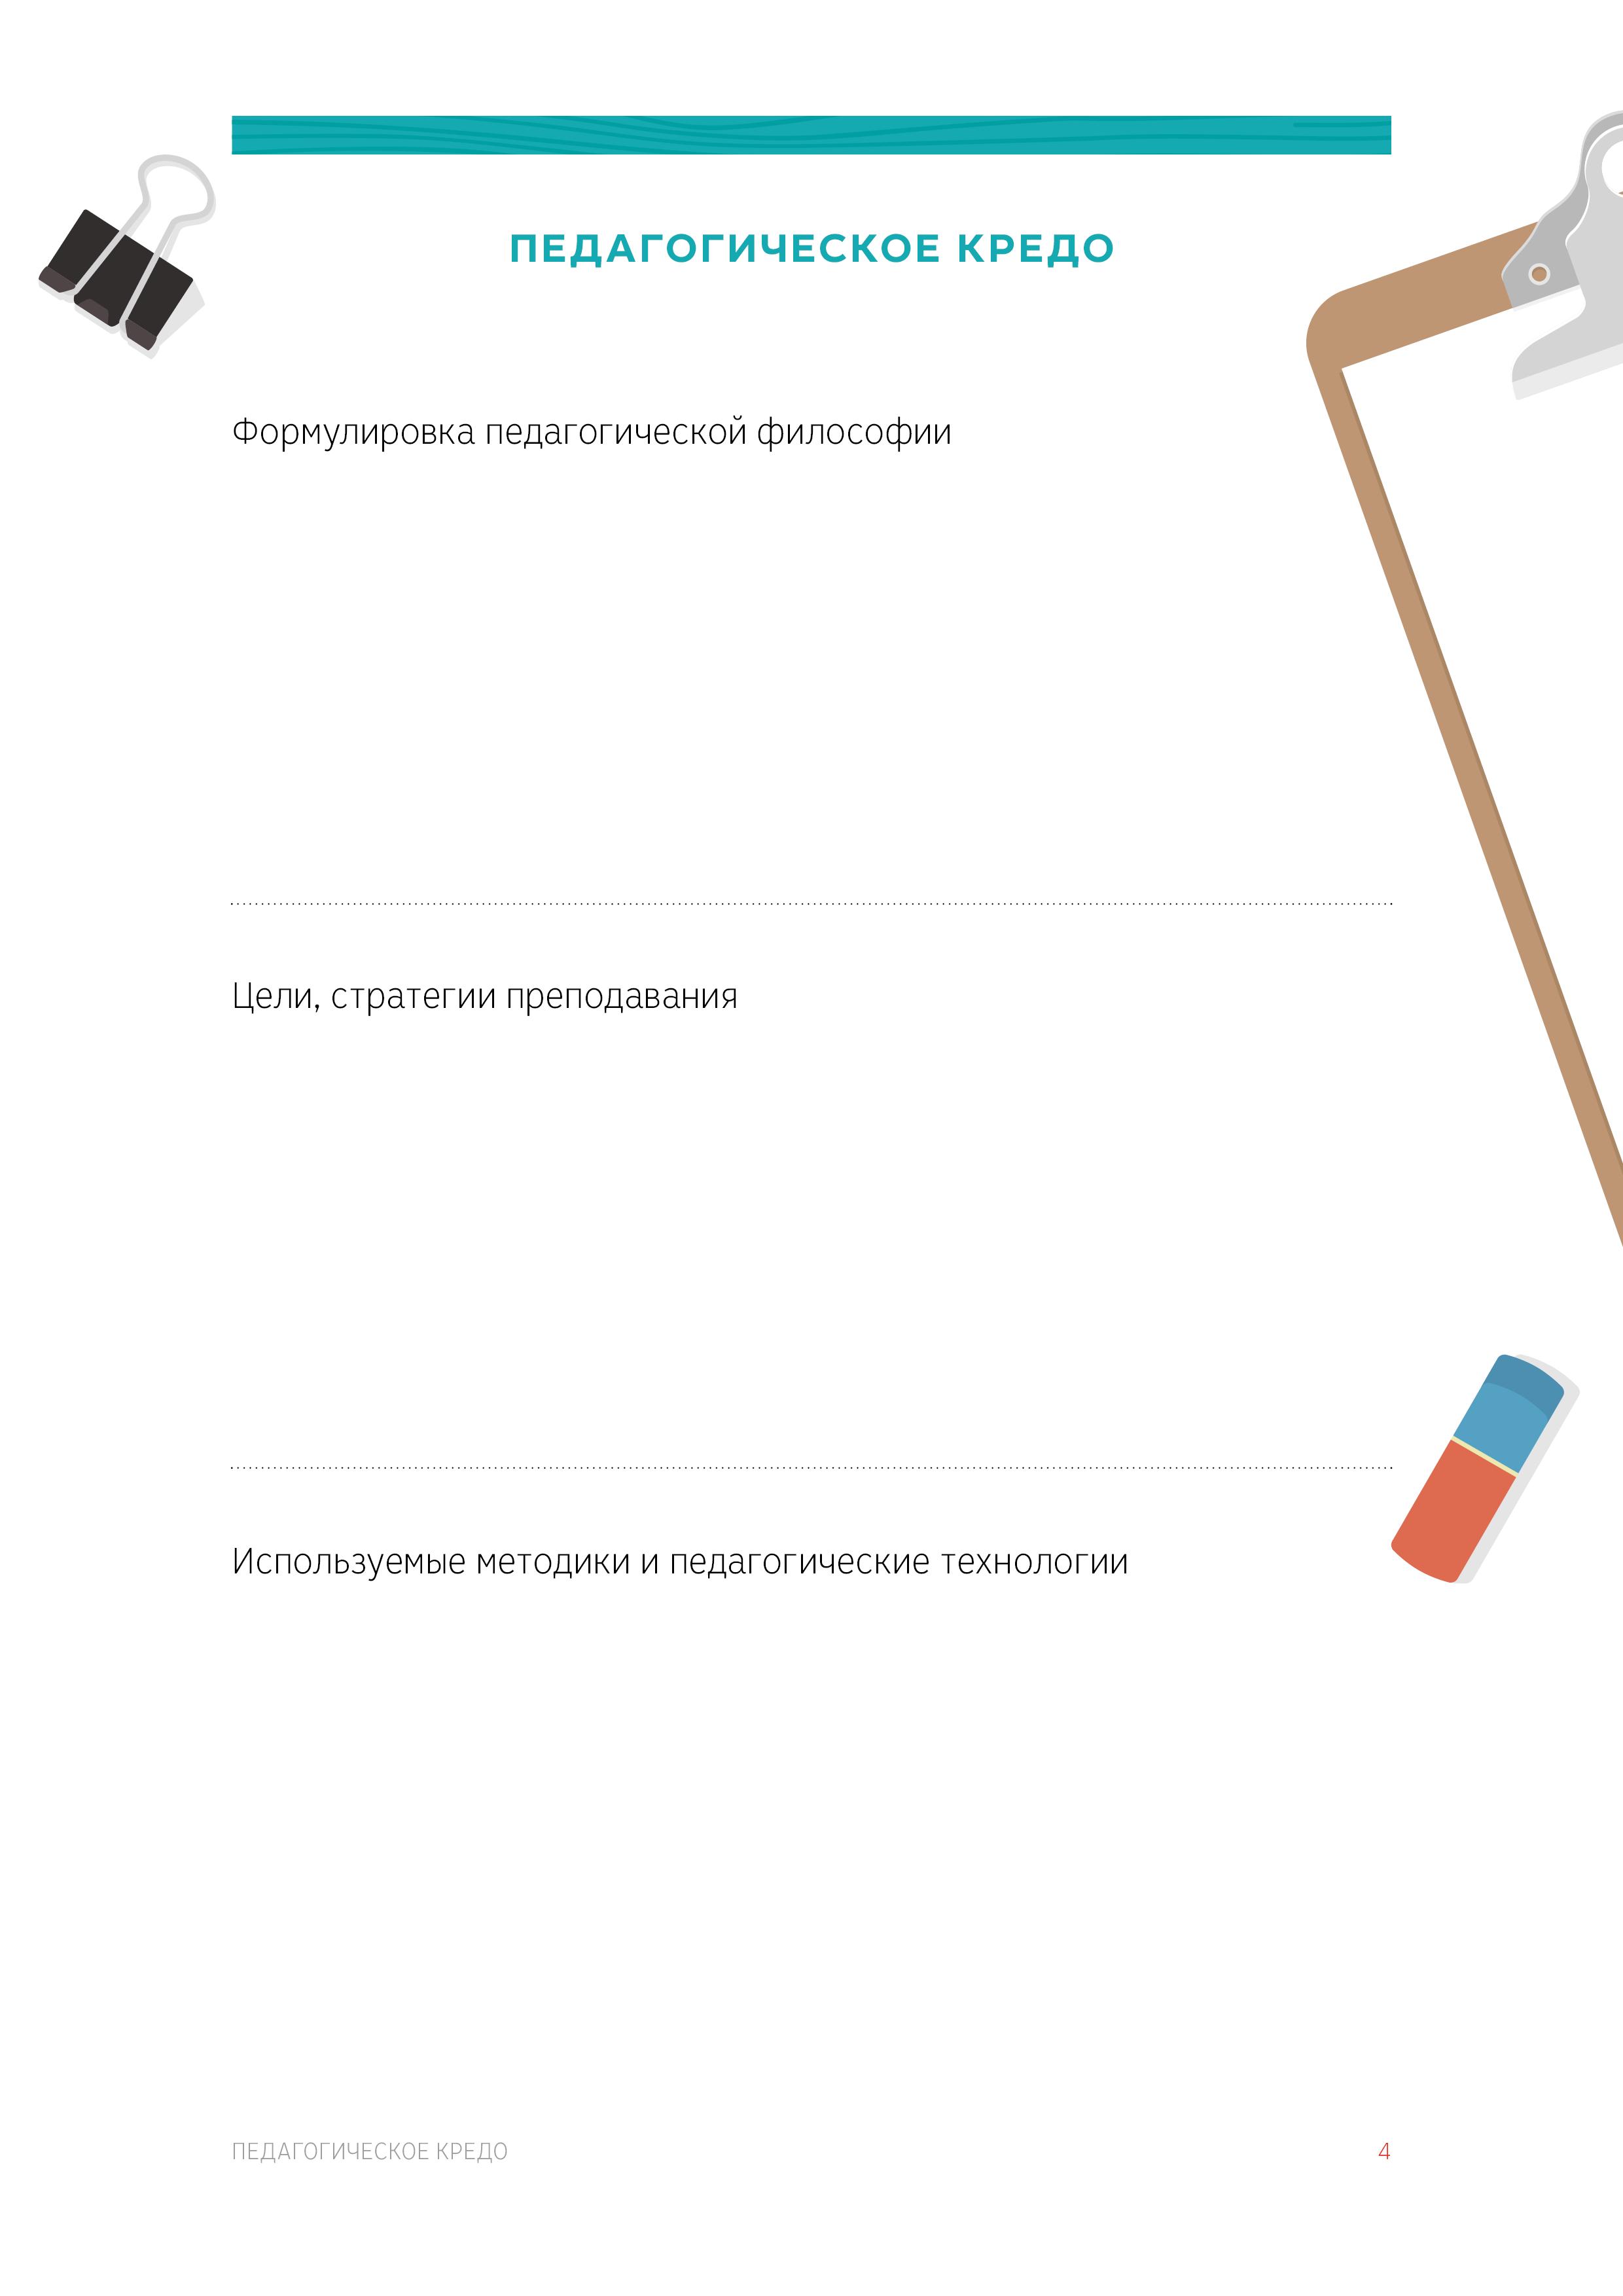 D:\projects\Александр\Олимпиады\Май2015\Портфель учителя\!send\my_portfolio1_33.png